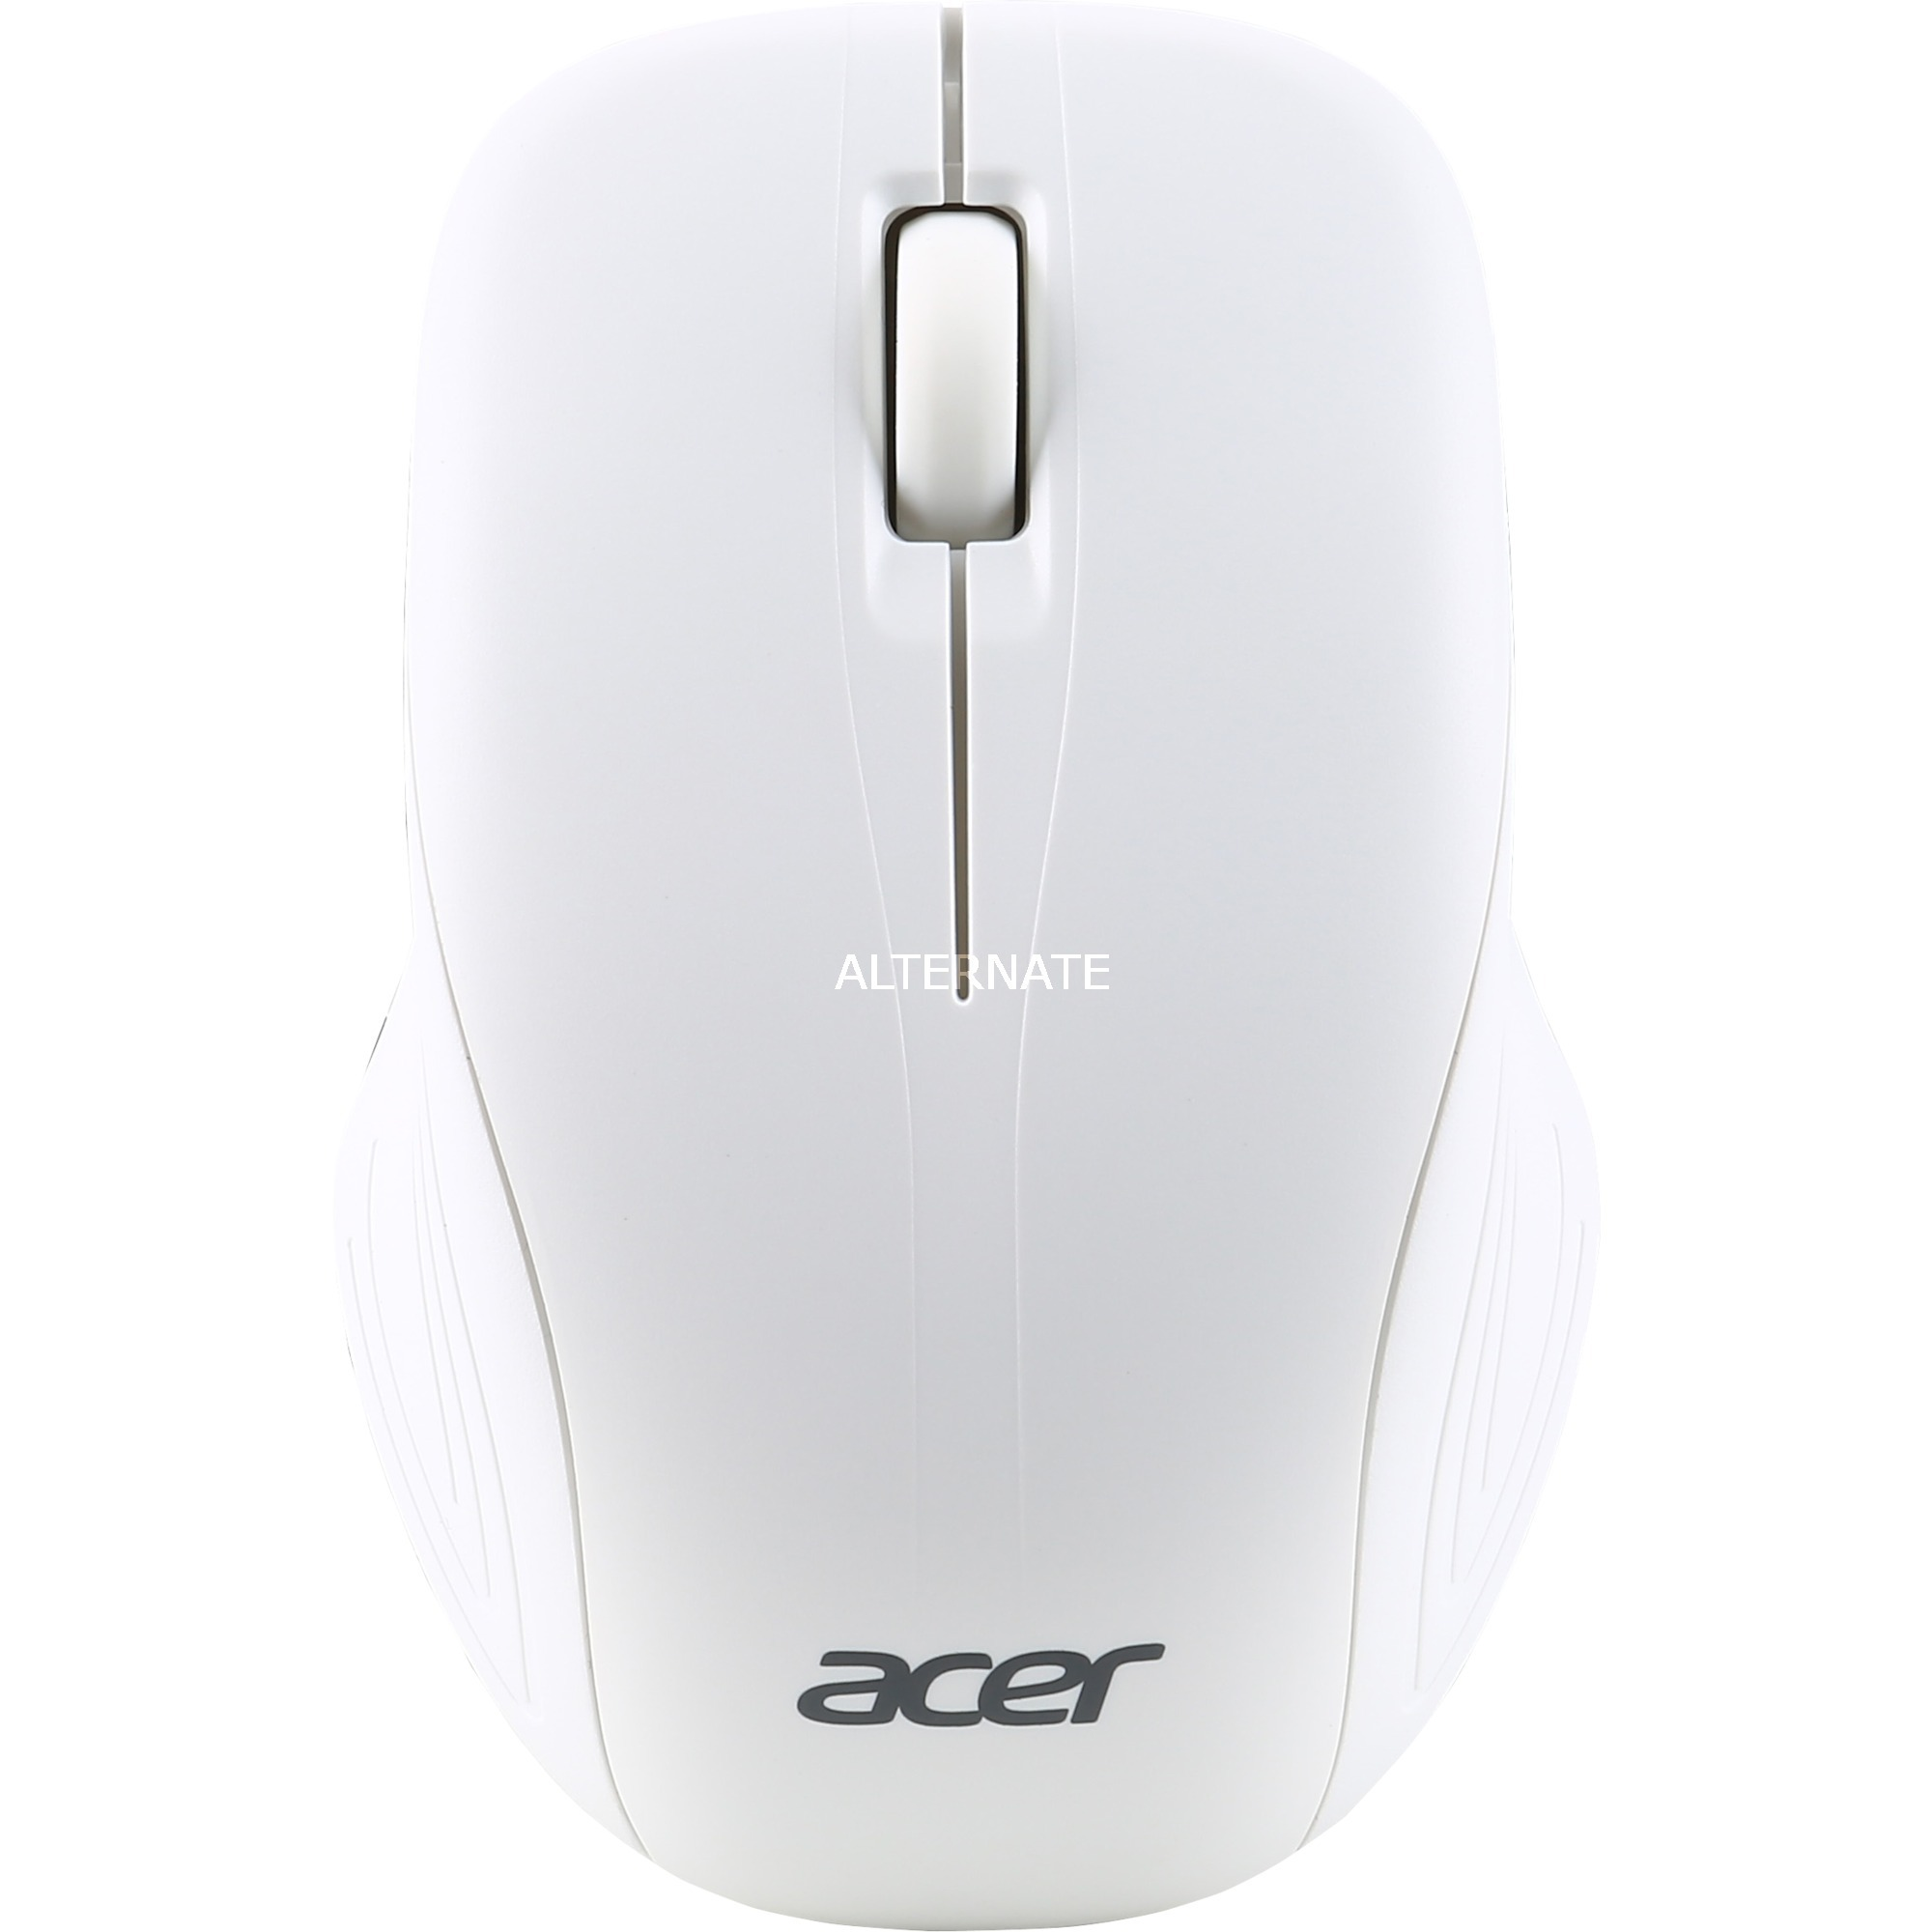 AMR510 RF inalámbrico Óptico 1000DPI Ambidextro Blanco ratón